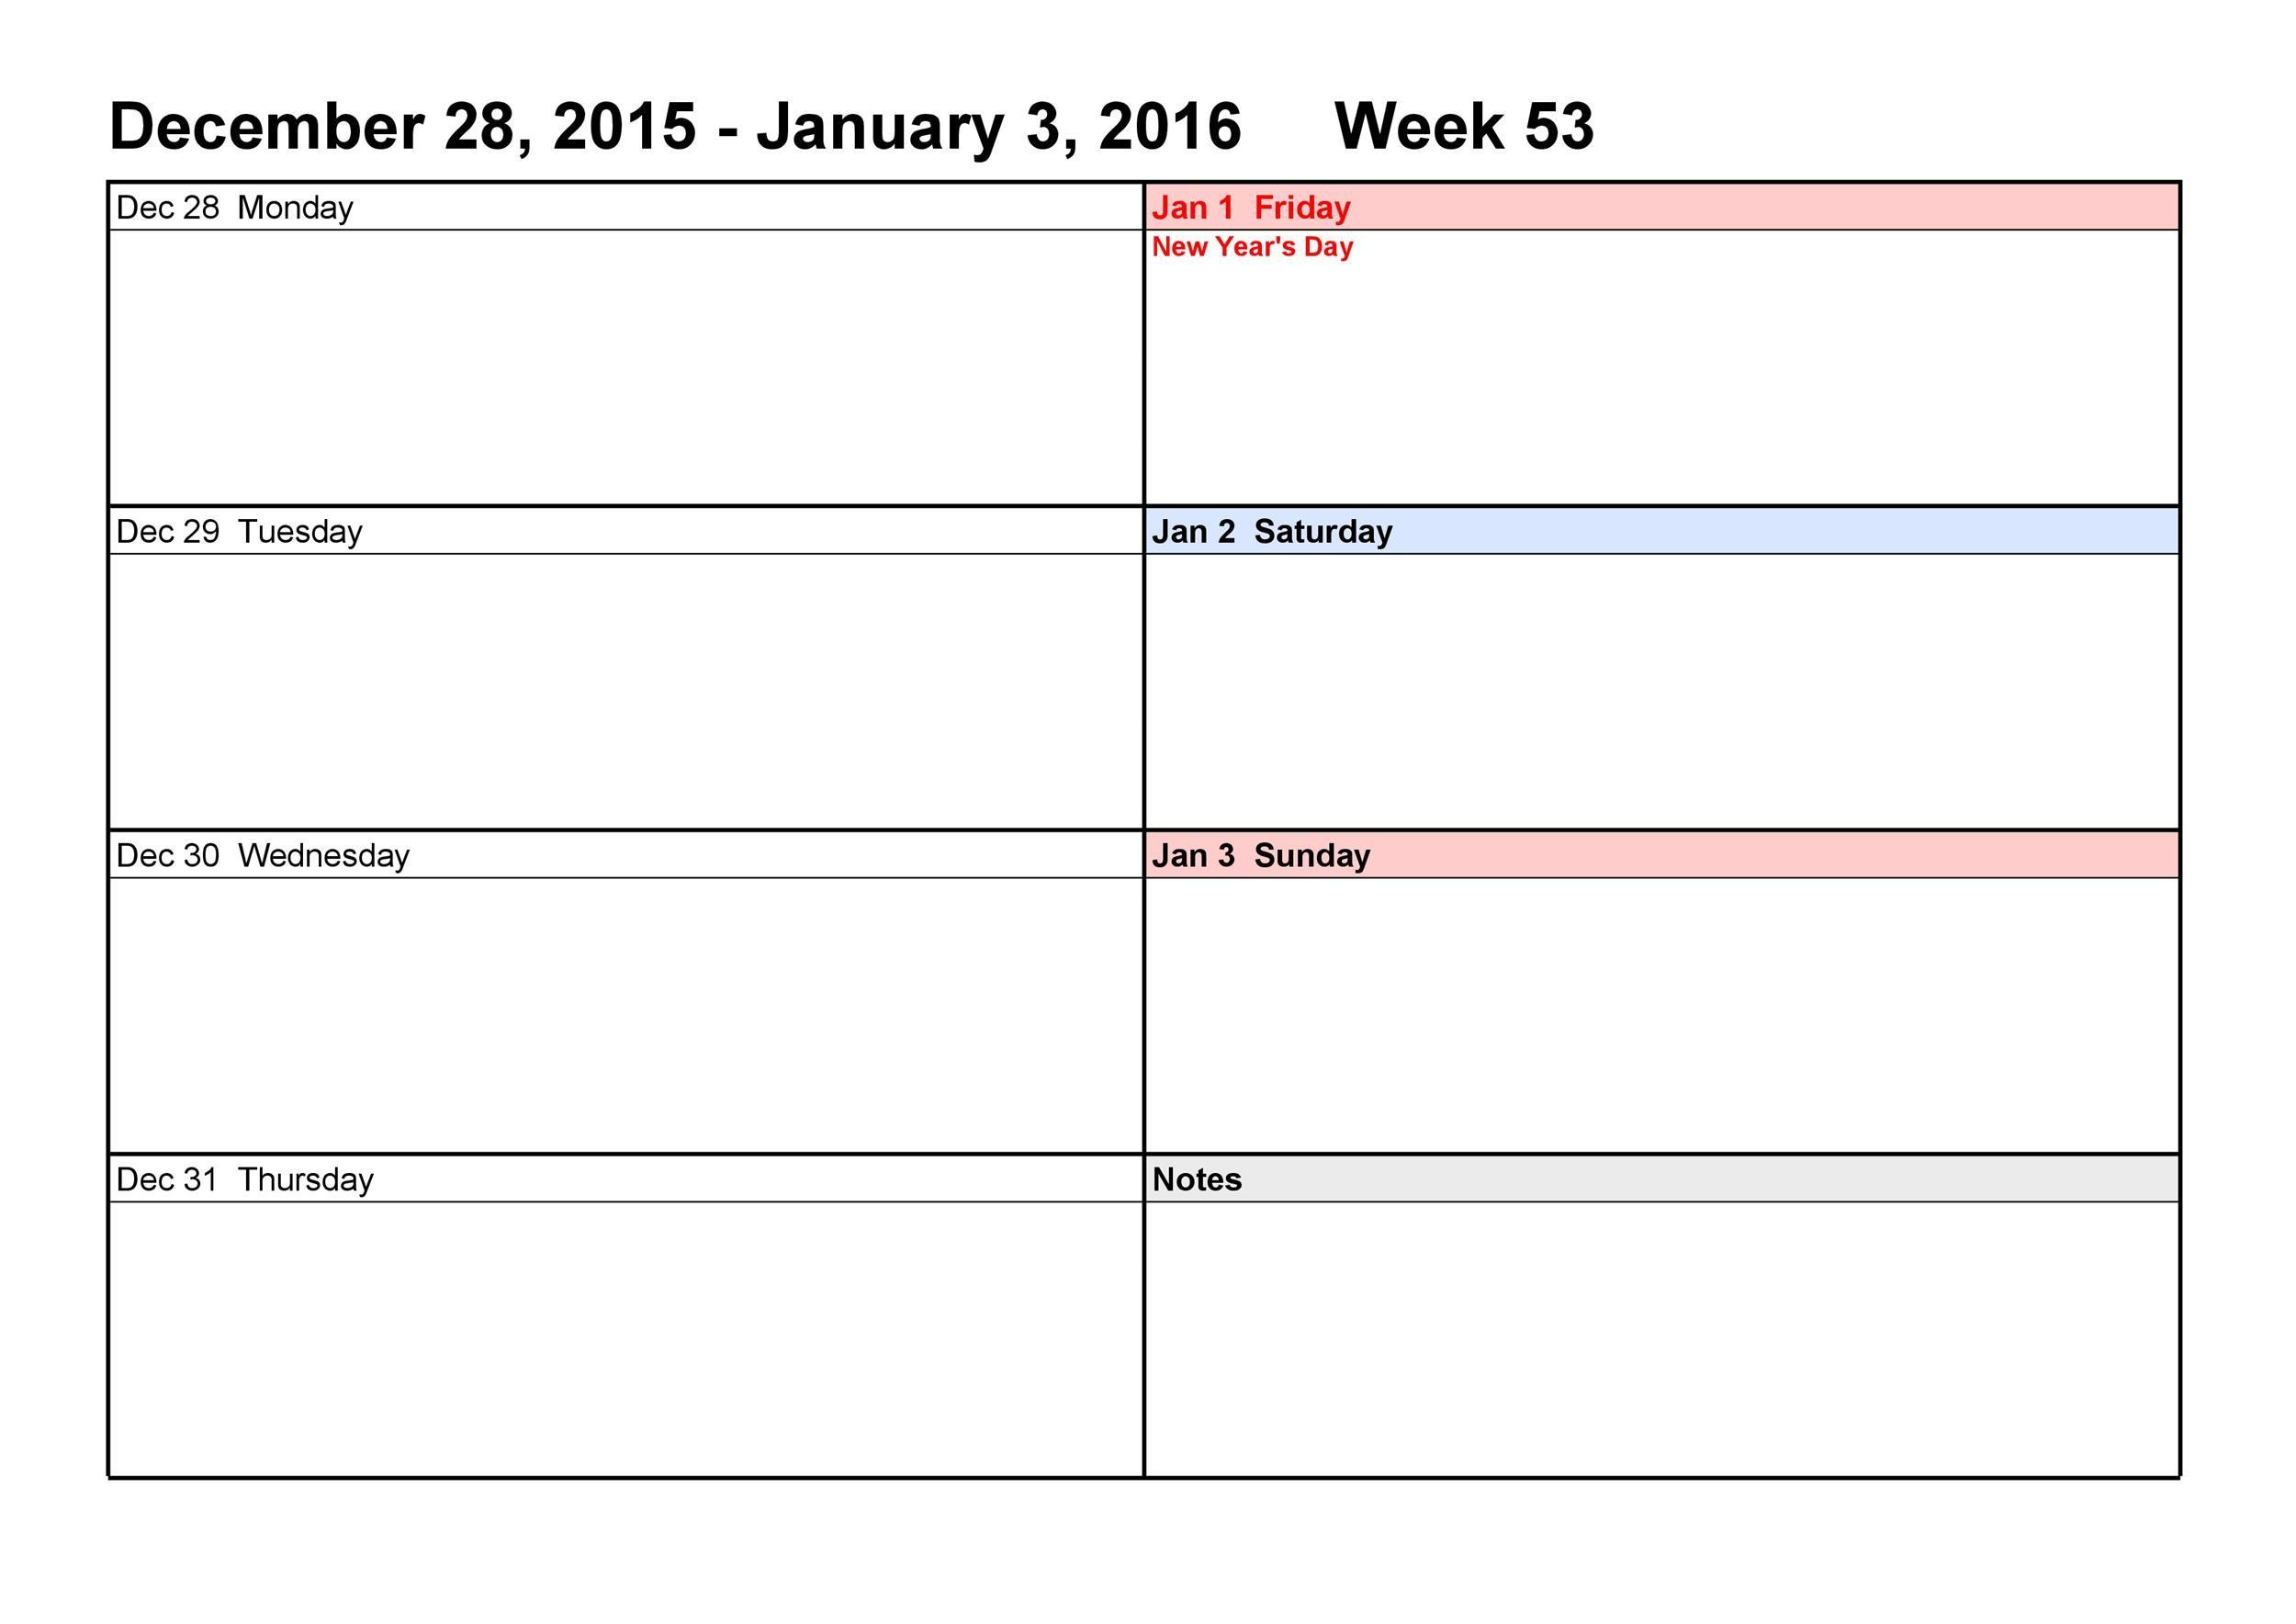 26 Blank Weekly Calendar Templates Pdf Excel Word E19085 1